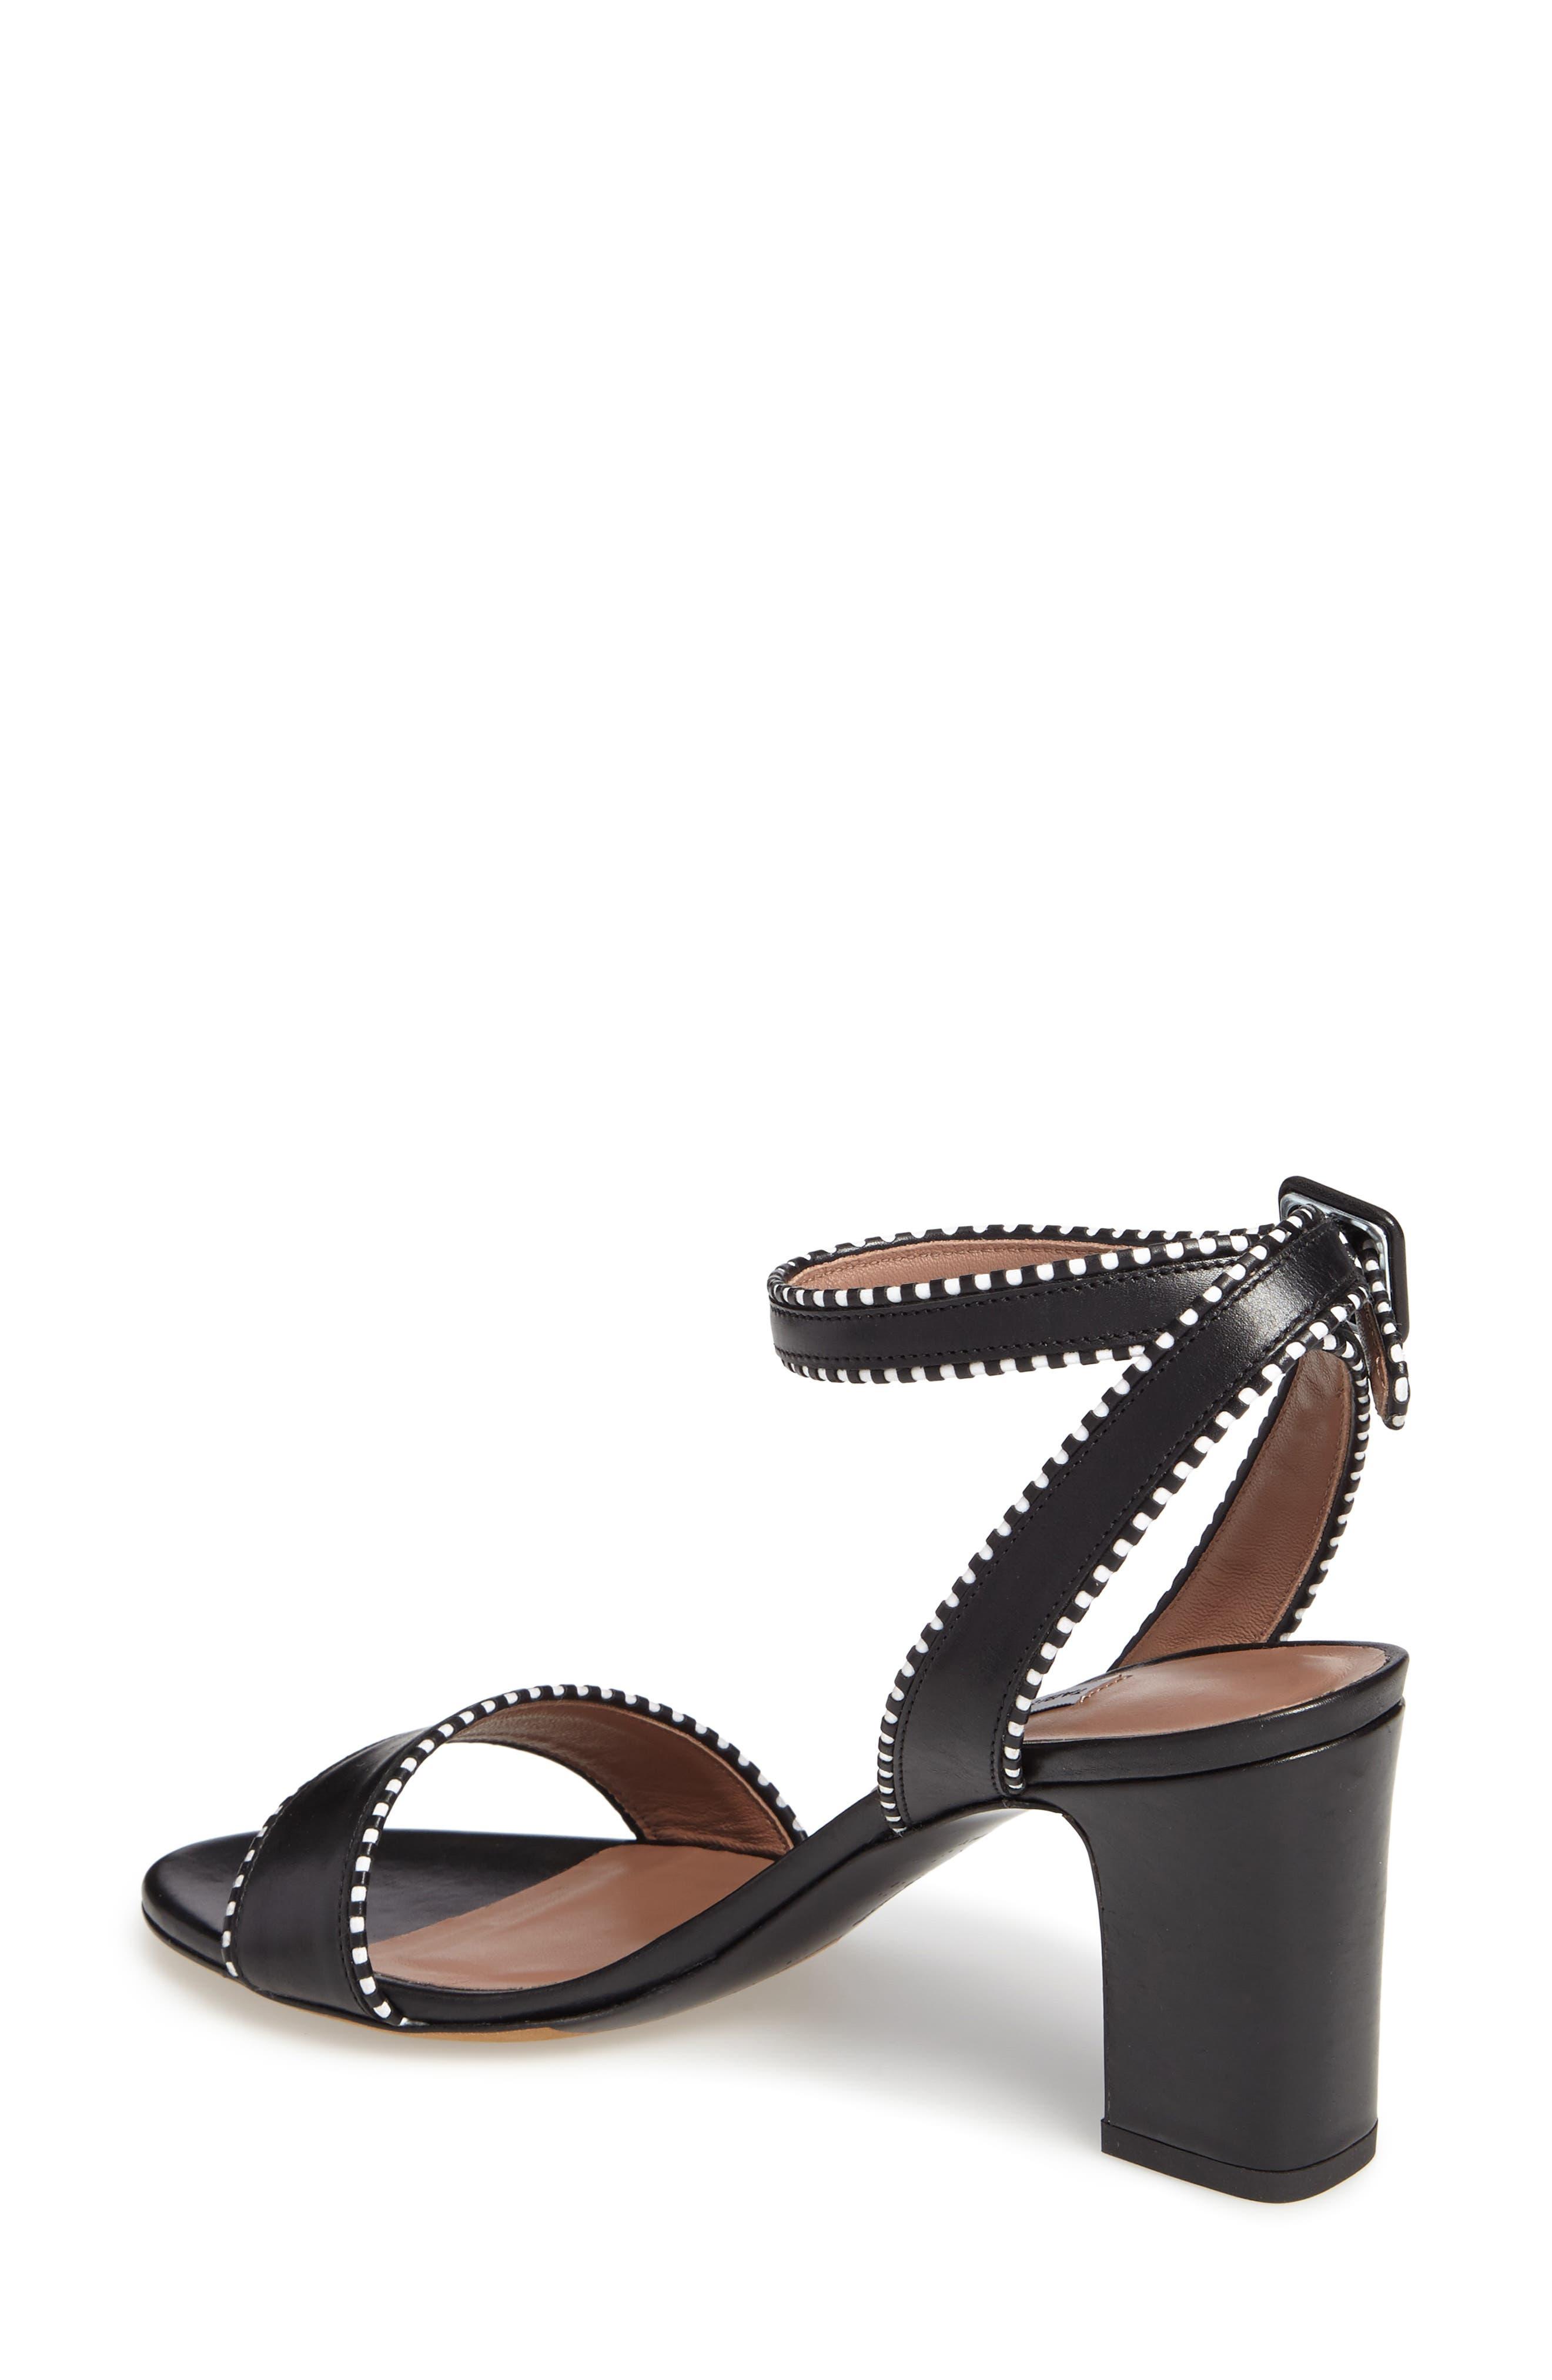 Leticia Profilo Ankle Strap Sandal,                             Alternate thumbnail 2, color,                             Black